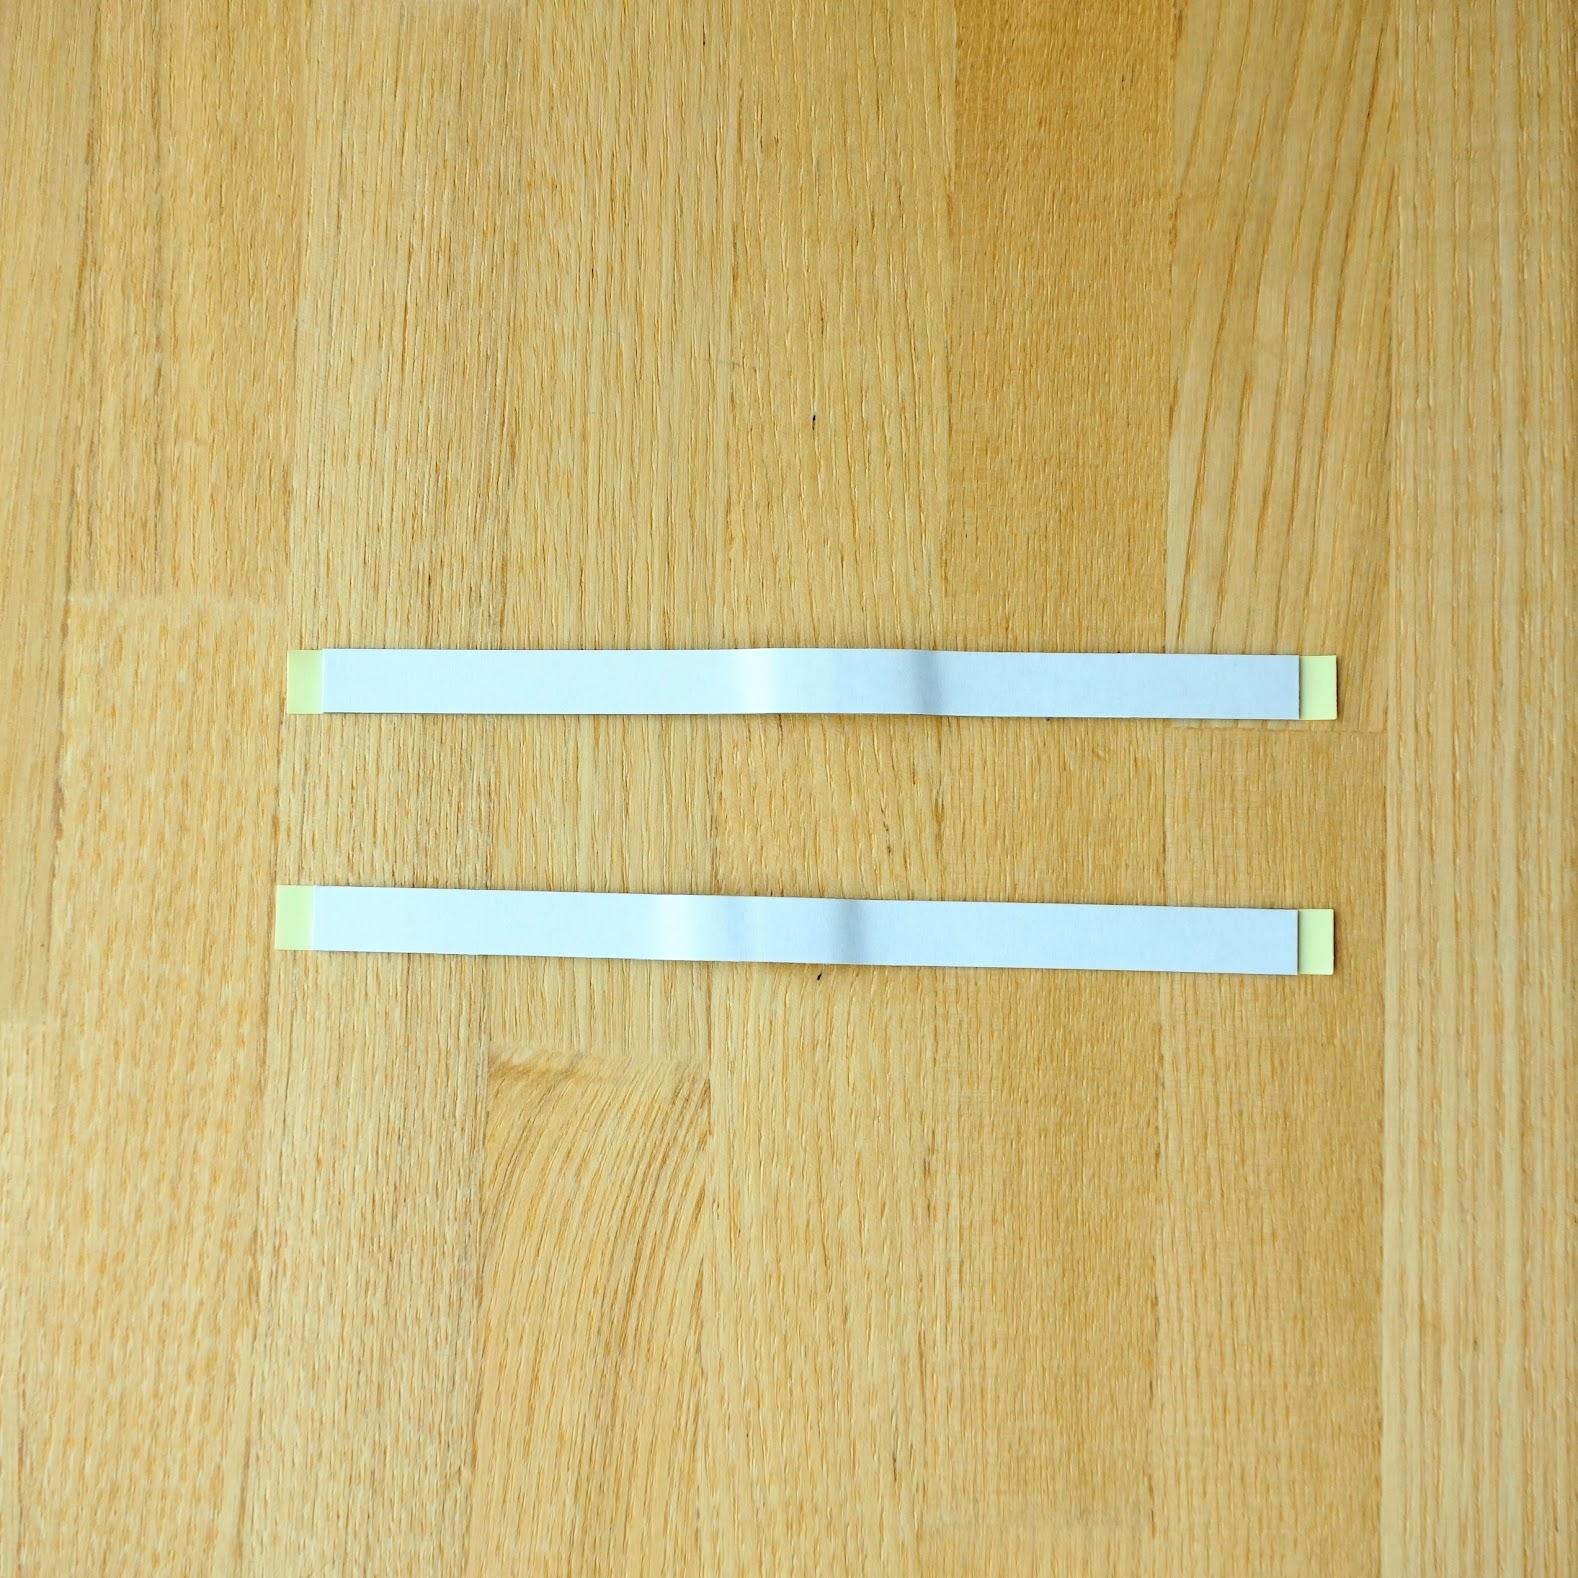 Majextandレビュー 予備の両面テープ